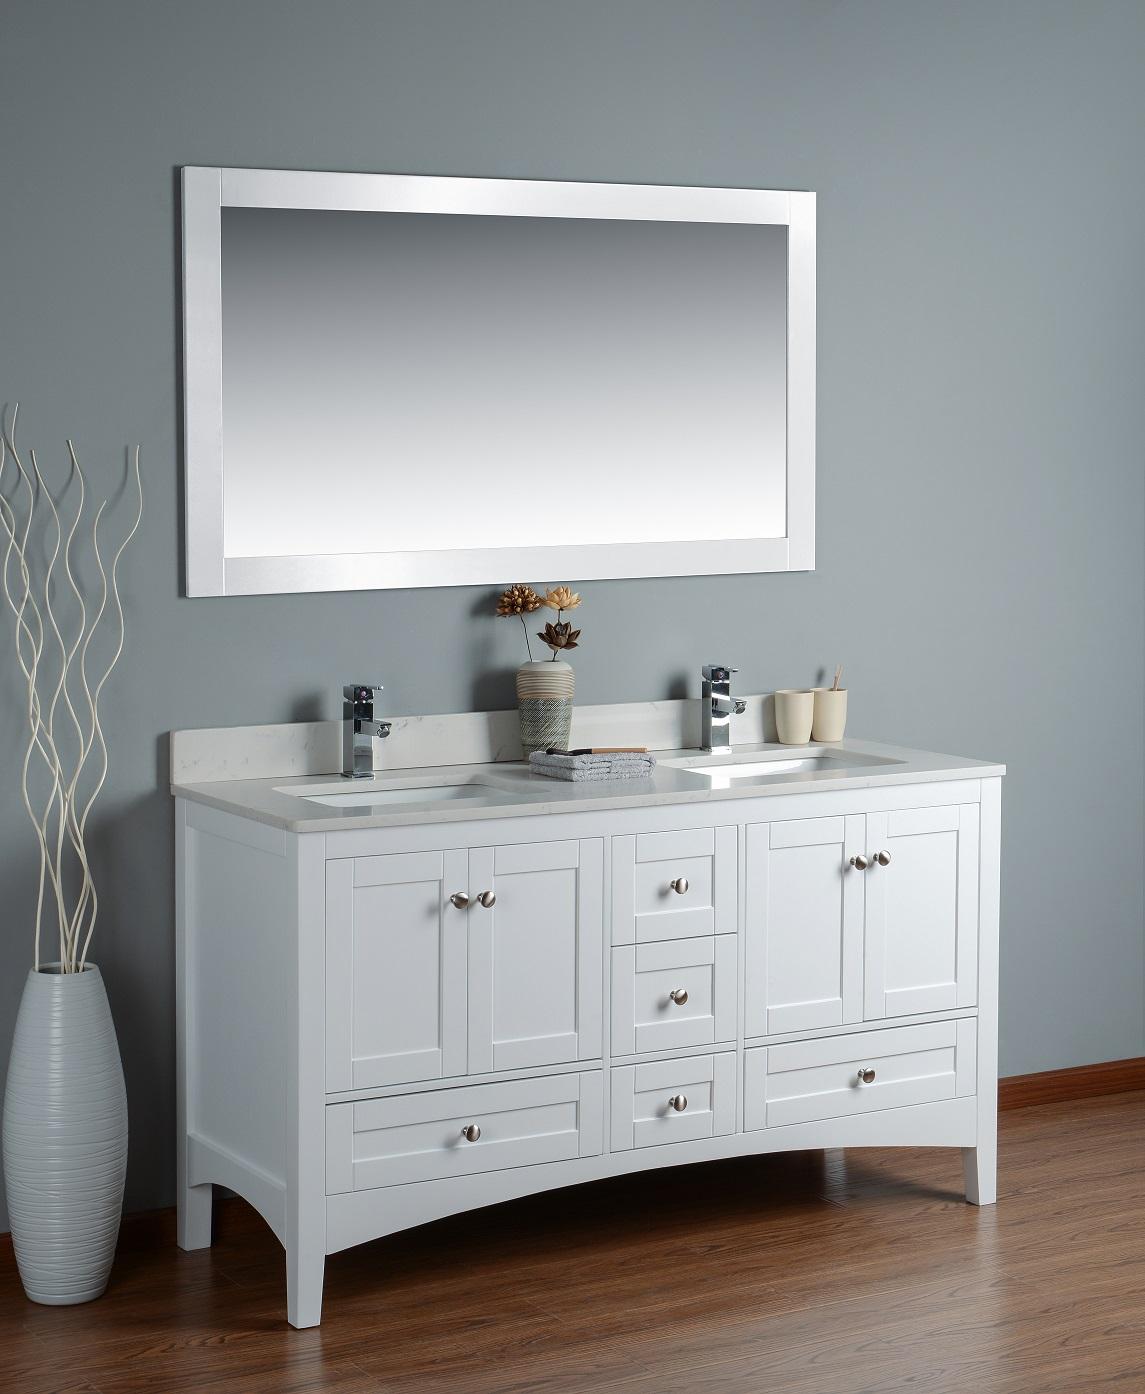 Inch Bathroom Vanity on 60 inch single vanity, 14 inch bathroom vanity, 96 inch bathroom vanity, 24 inch bathroom vanity, 40 inch bathroom vanity, 60 inch bathroom vanities clearance, 28 inch bathroom vanity, 60 inch fireplace surround, 60 inch kitchen, 60 inch utility vanity, 80 inch bathroom vanity, 60 inch wardrobe, 60 inch bathroom vanities discount, 68 inch bathroom vanity, 60 inch bathroom countertops, 85 inch bathroom vanity, 83 inch bathroom vanity, 23 inch bathroom vanity, 10 inch bathroom vanity, 60 inch wet bar,